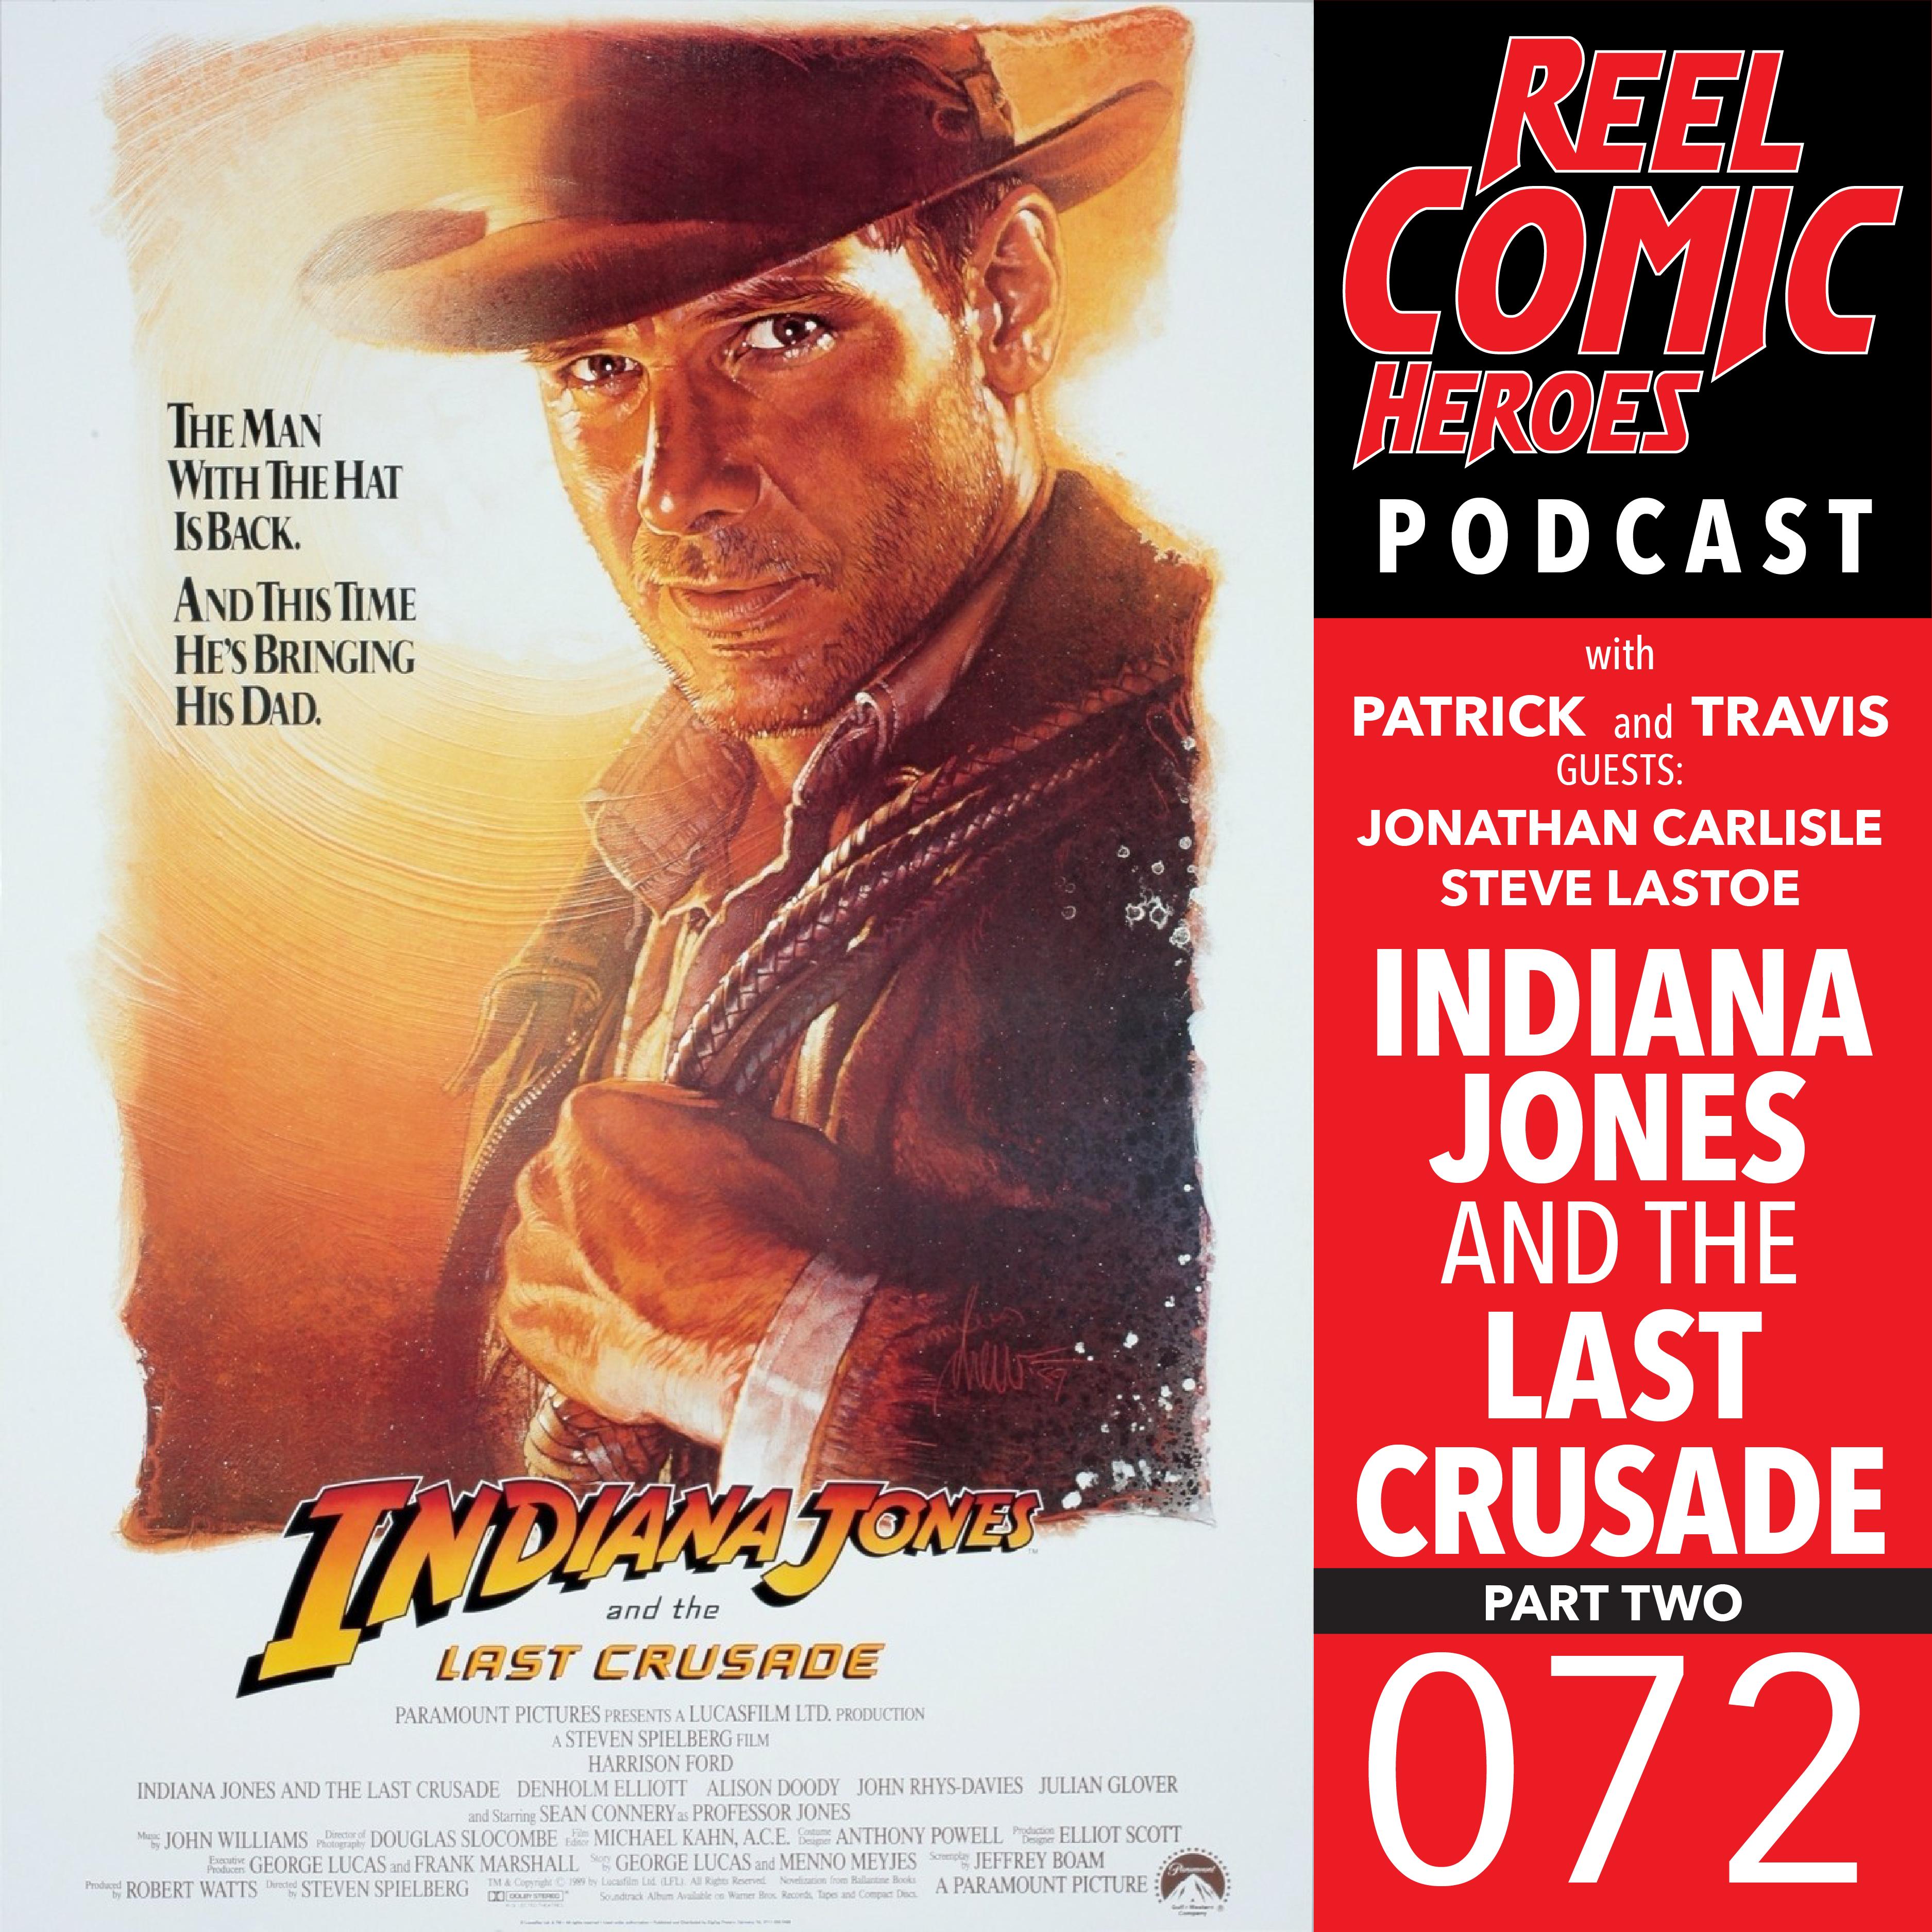 Artwork for Reel Comic Heroes 072 - Indiana Jones and the Last Crusade Pt. 2